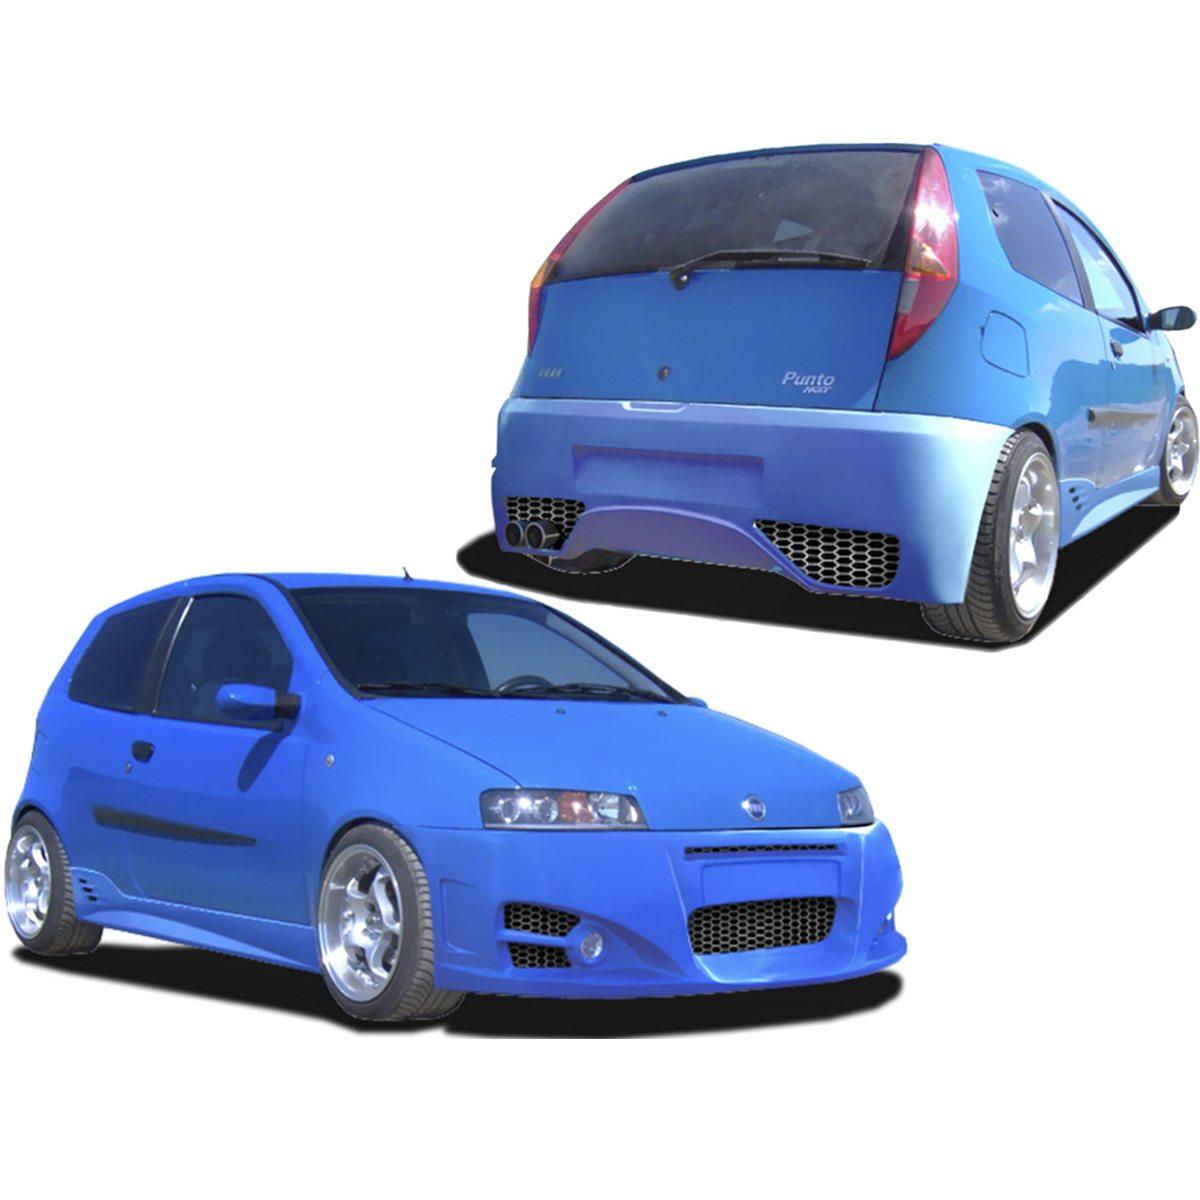 Fiat-Punto-00-3P-Ghost-KIT-QTU043